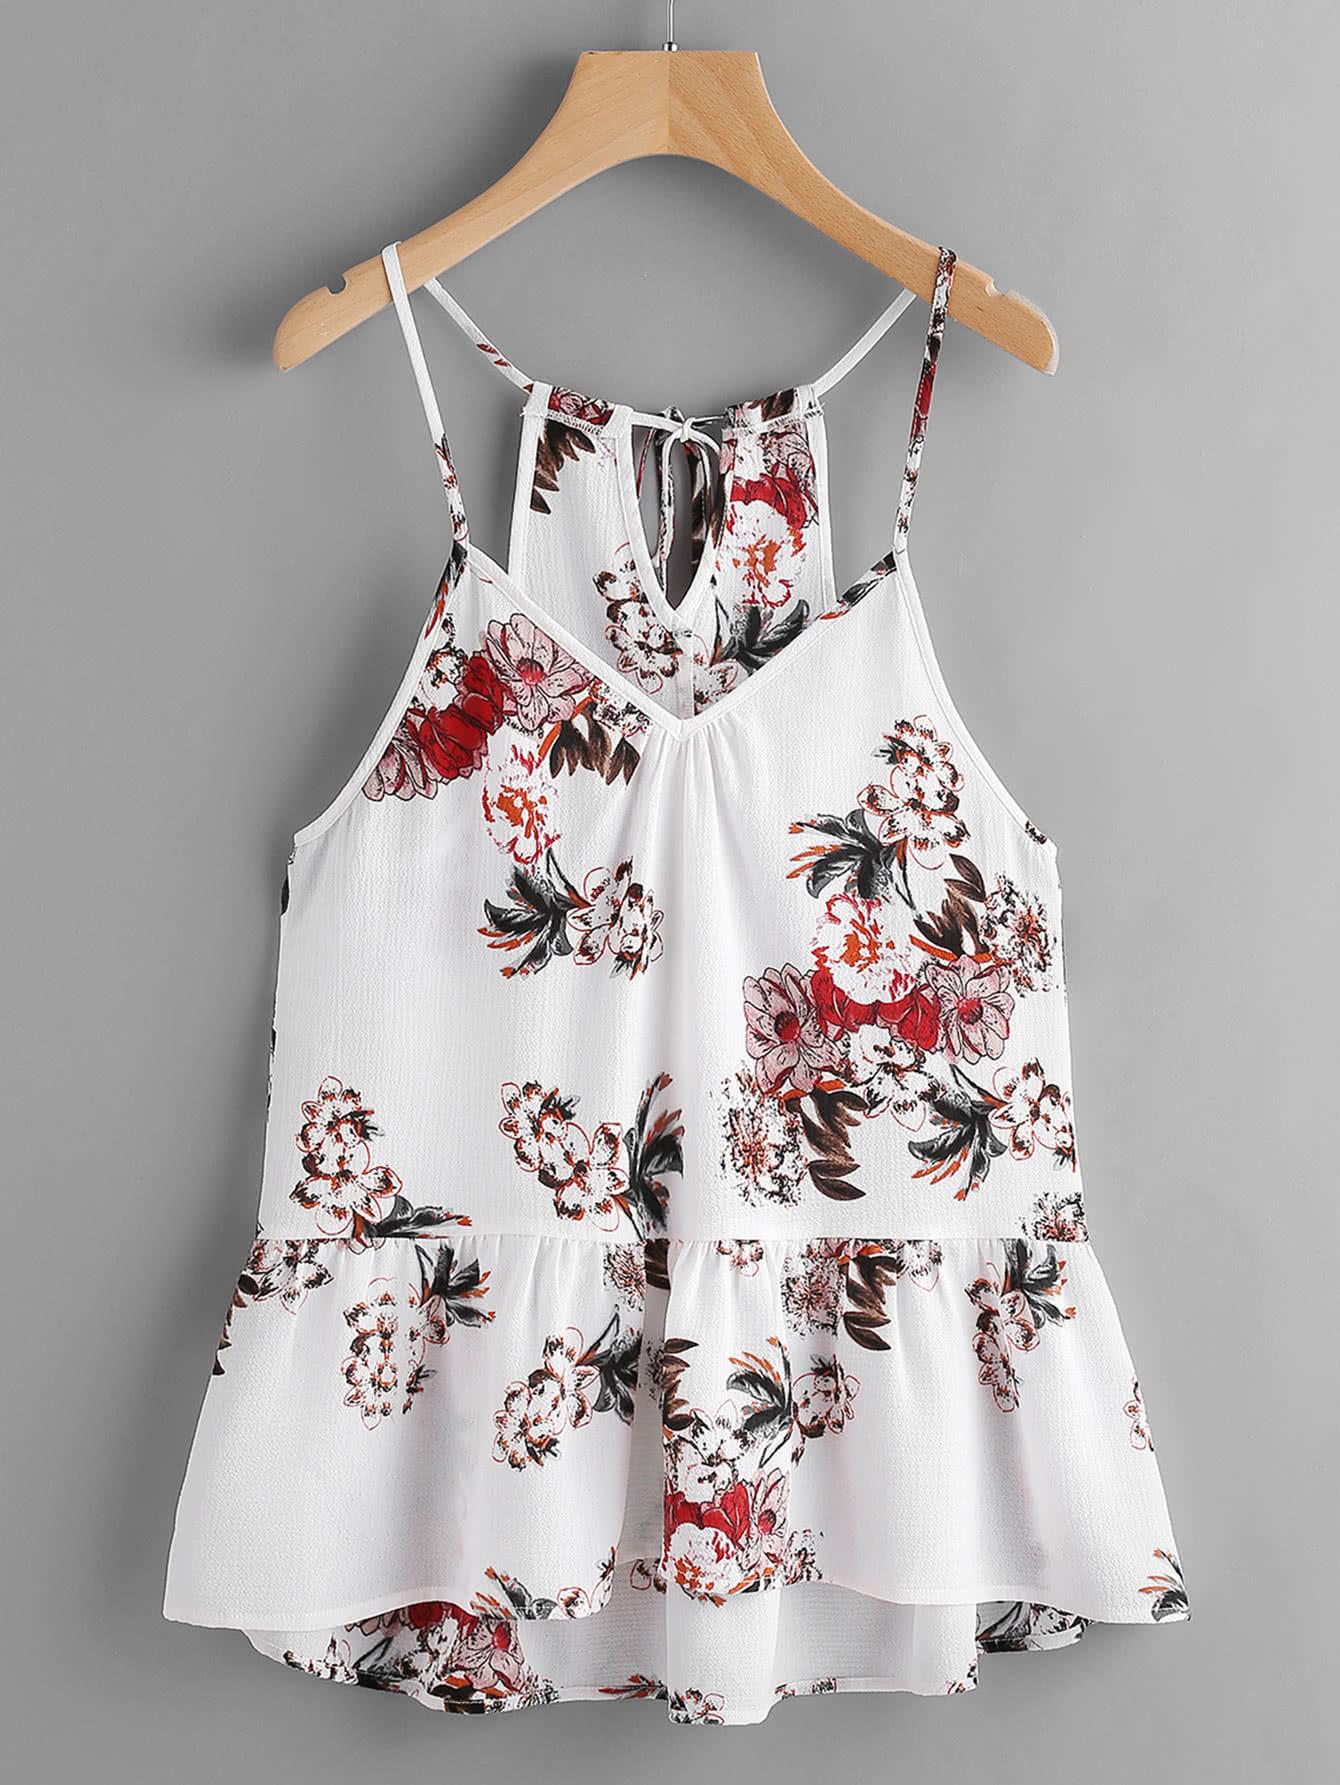 Flower Print Keyhole Self Tie Back Peplum Cami Top criss cross back self tie slub cami top